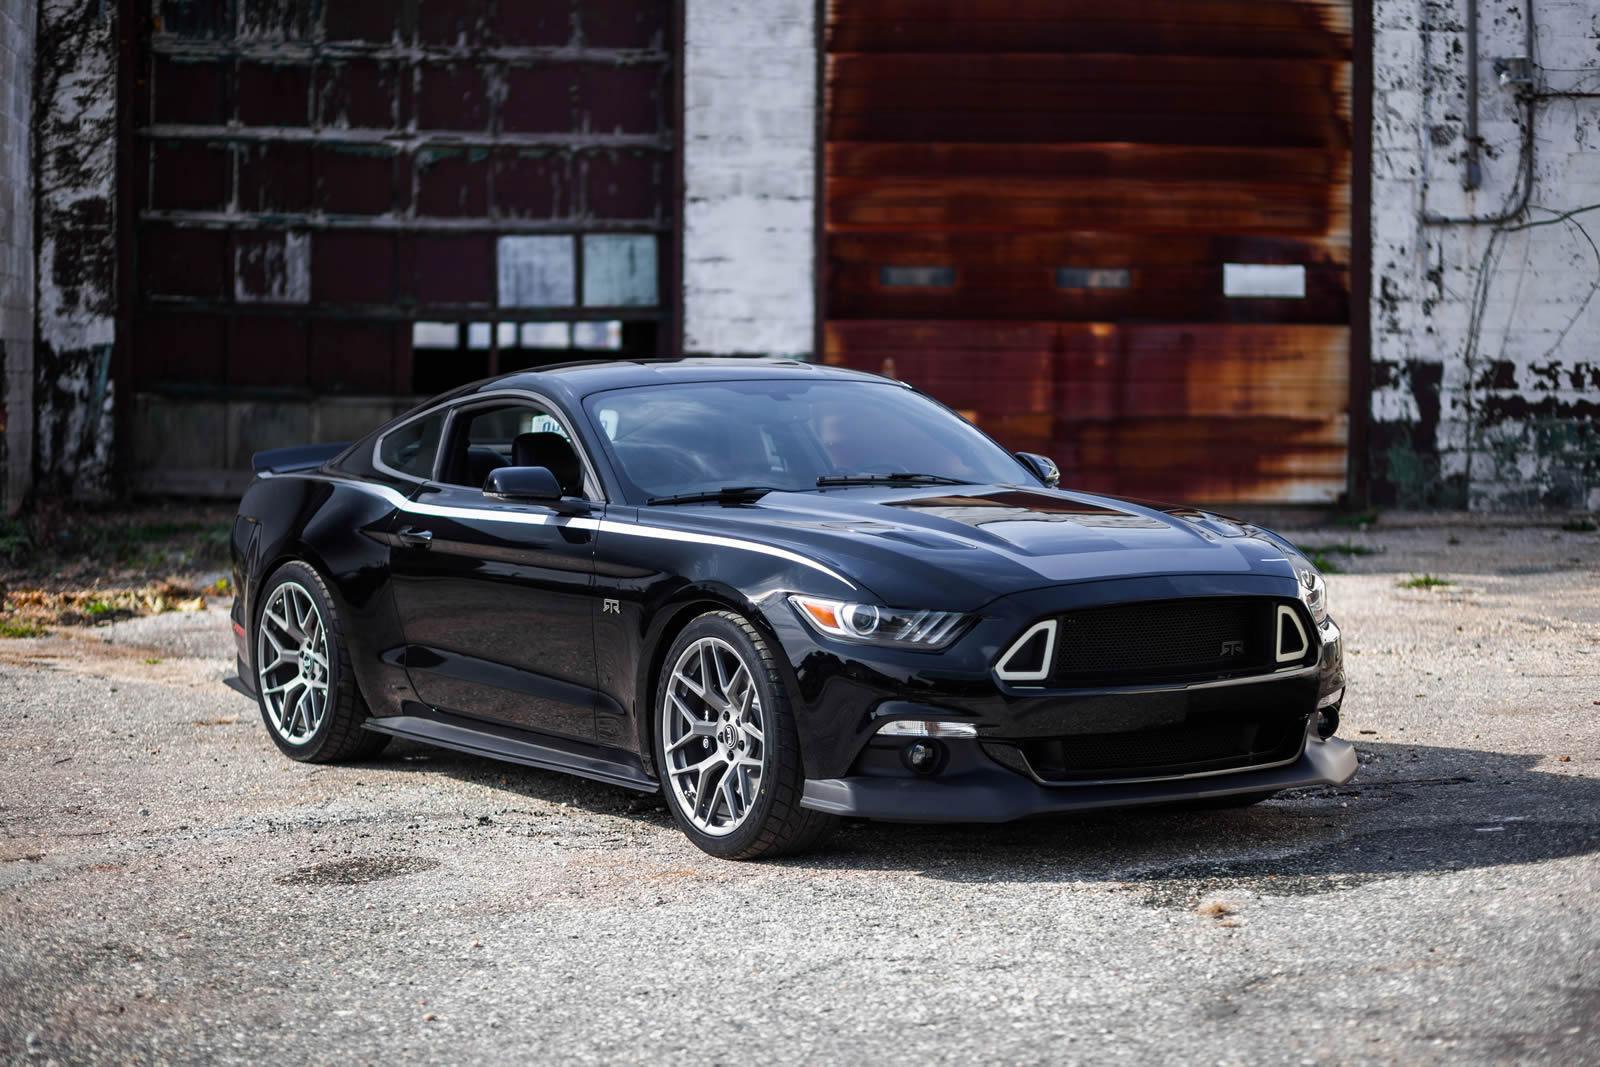 2015 Mustang RTR 1